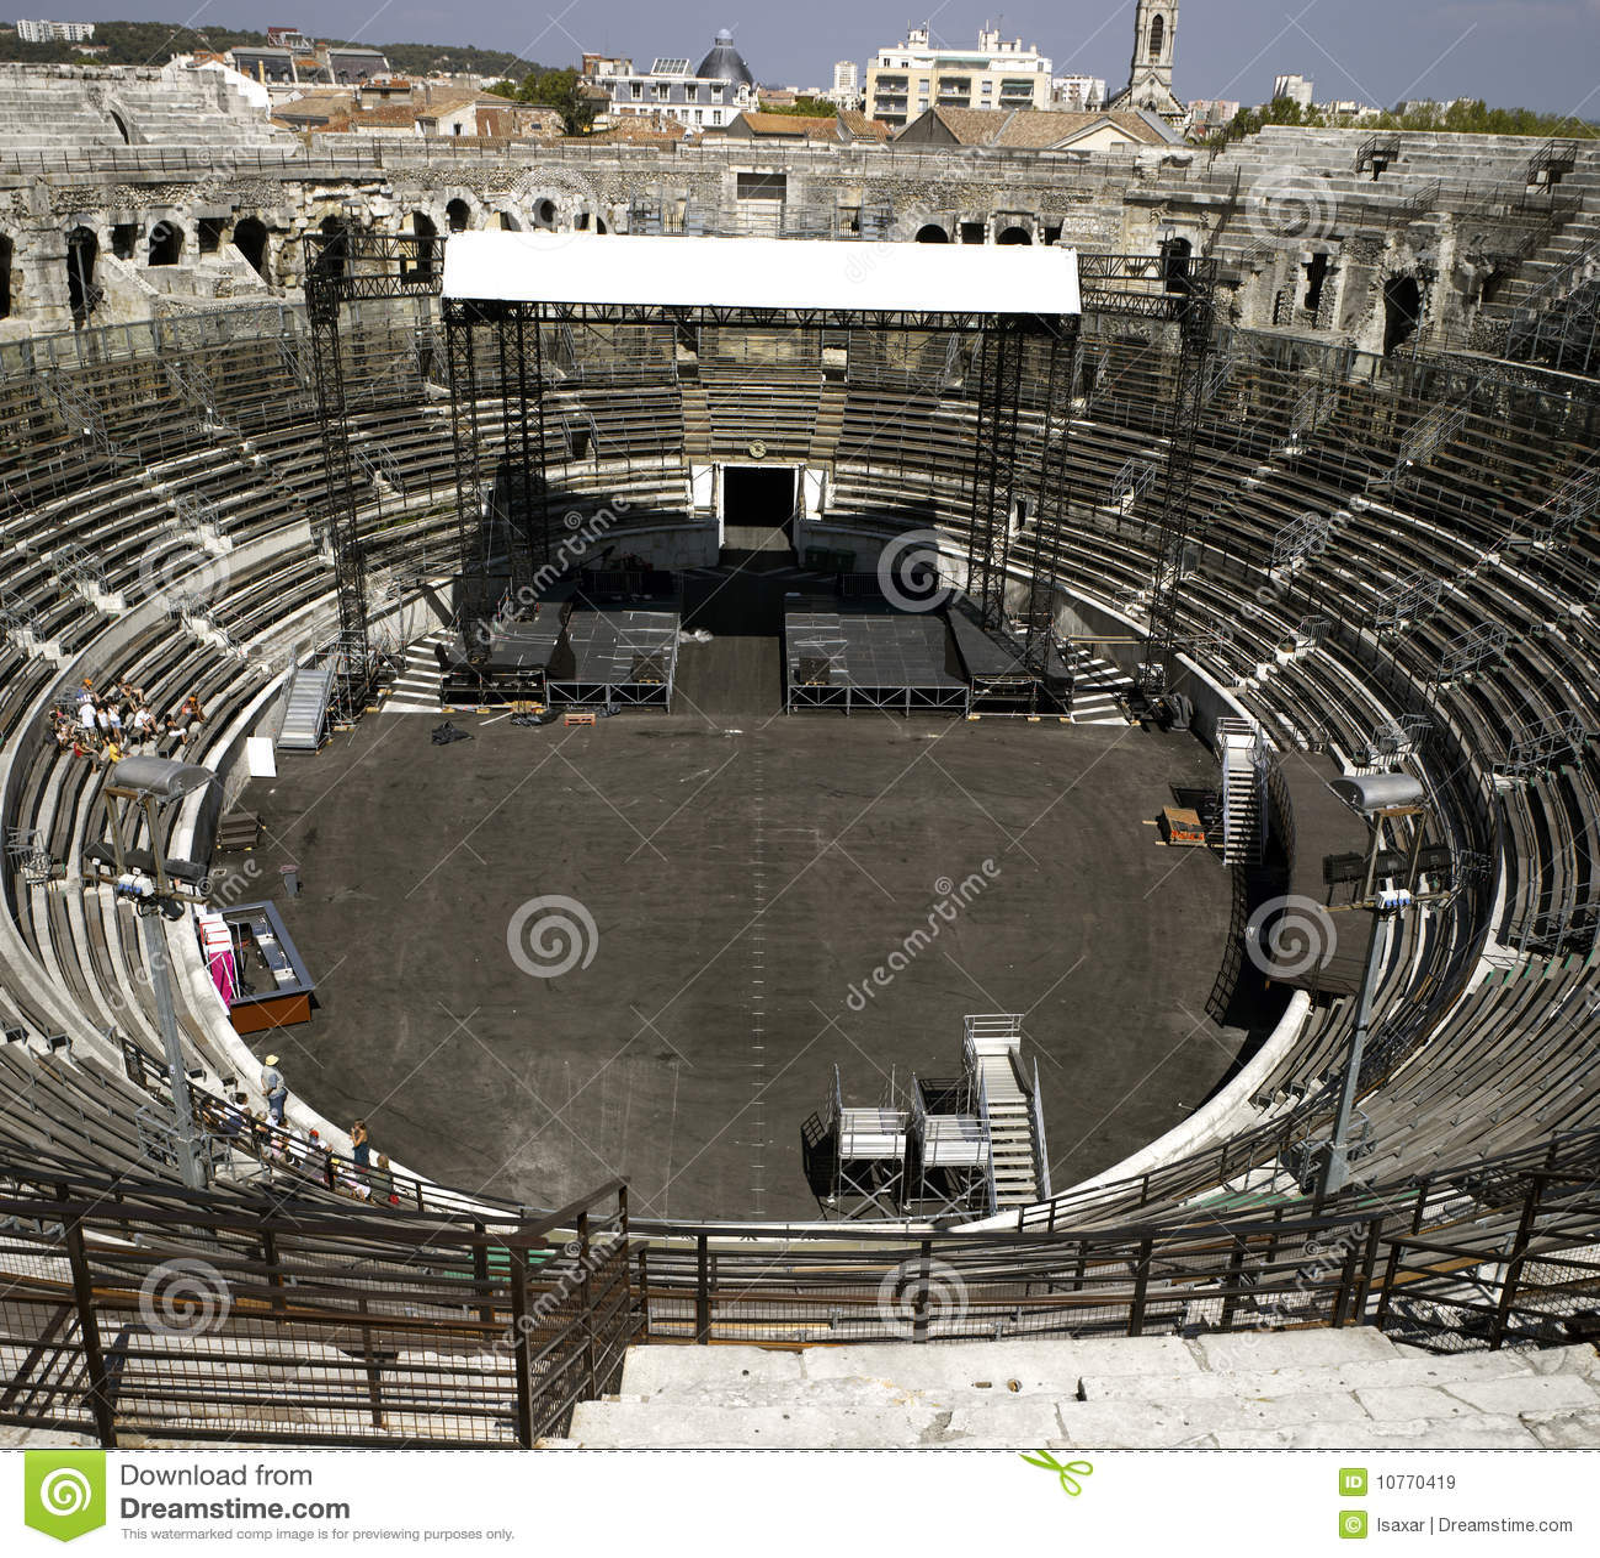 Nimes: O amphitheater romano